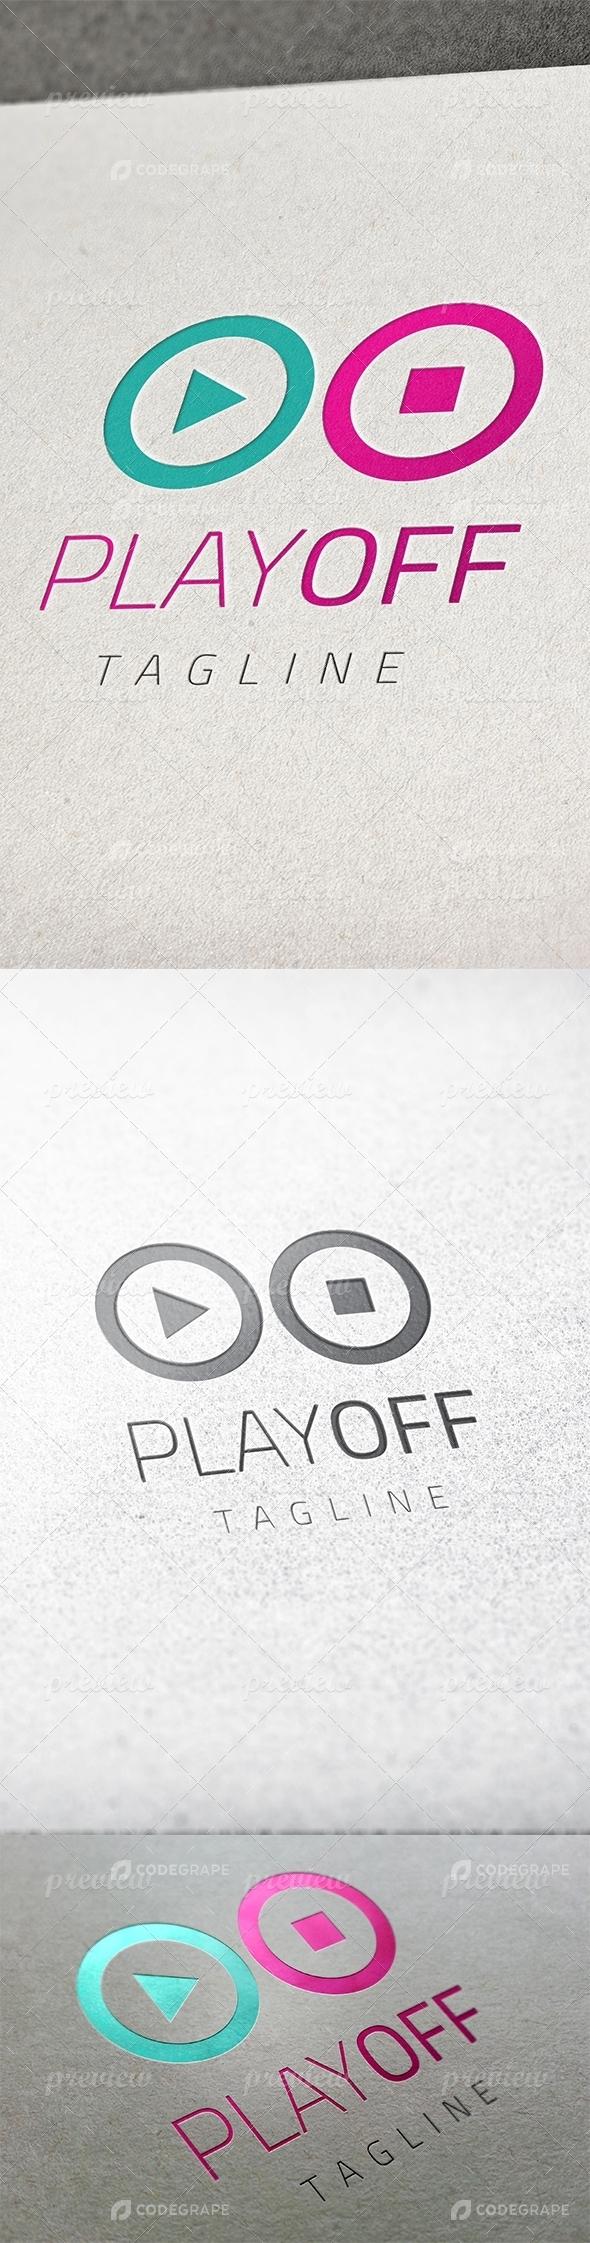 Playoff Logo